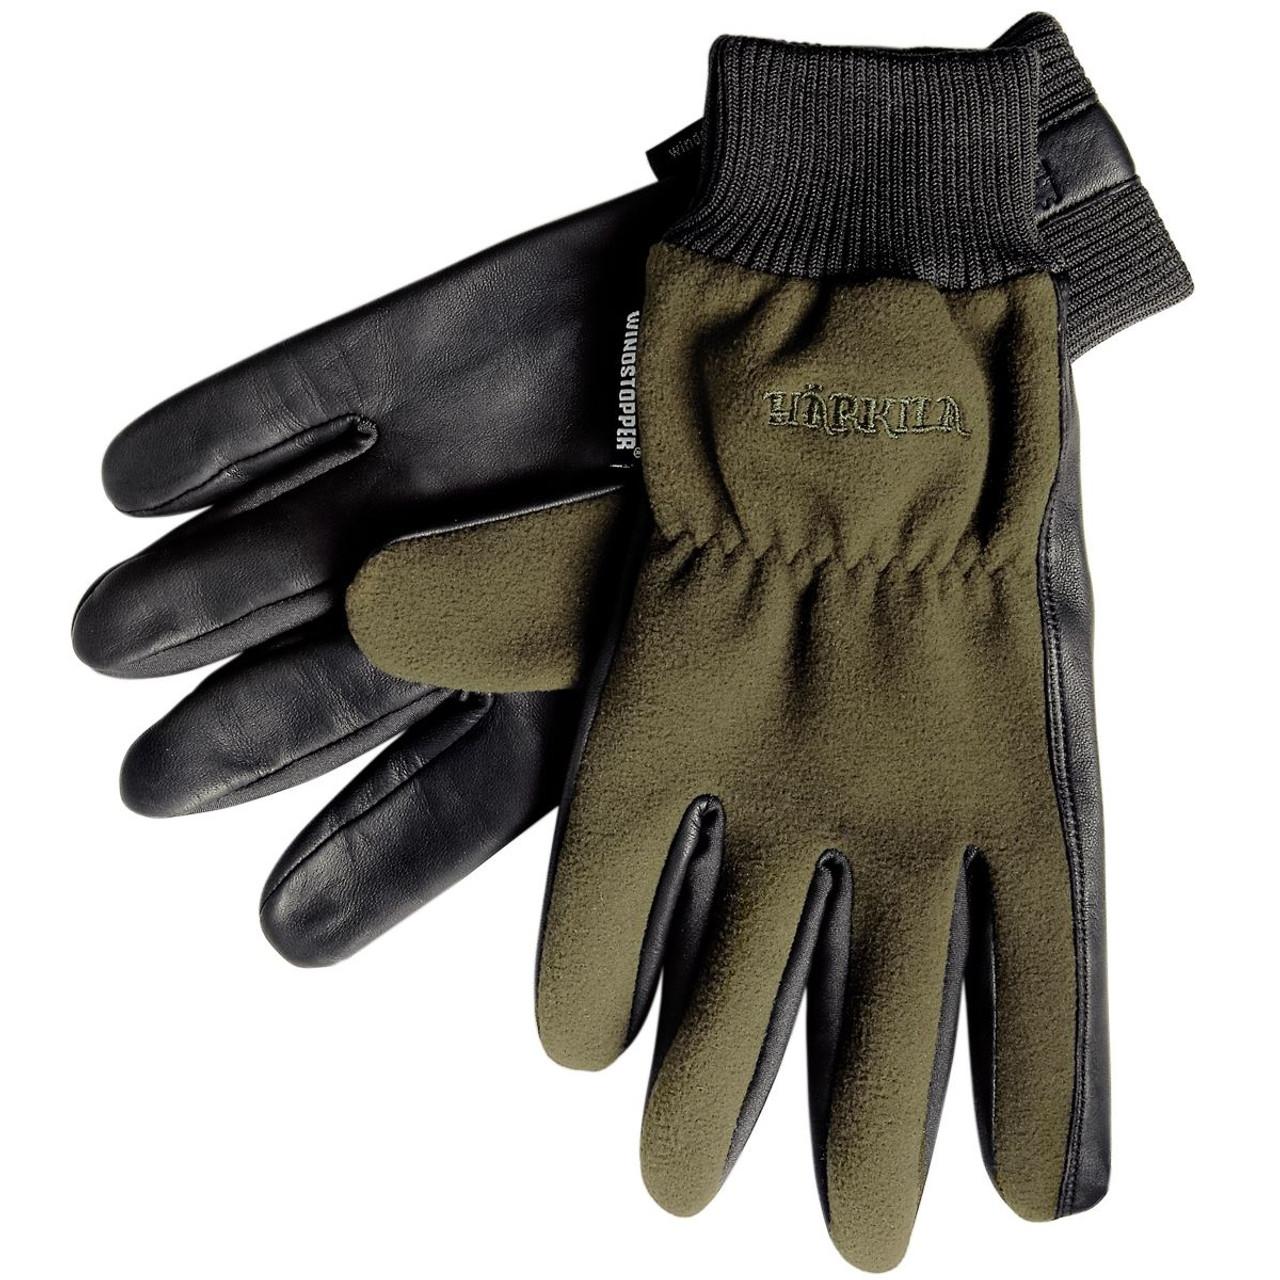 Harkila Pro Shooter Gloves - Green